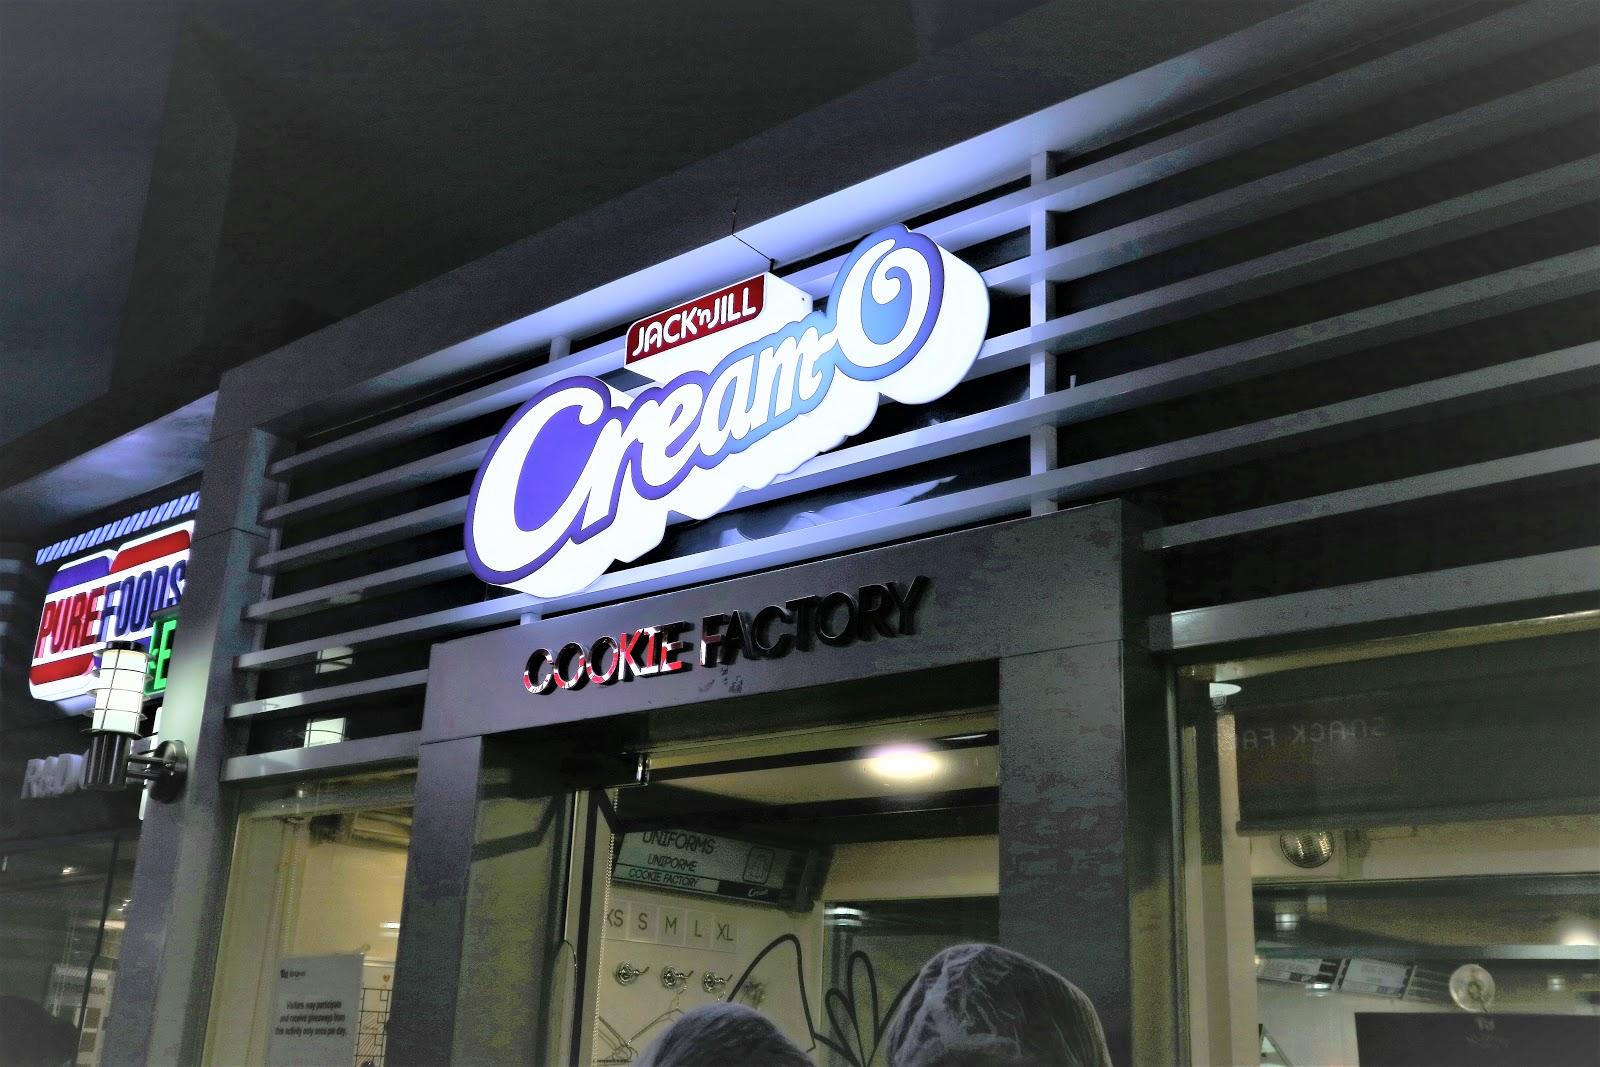 Jack 'n Jill Cream-O Cookie Factory